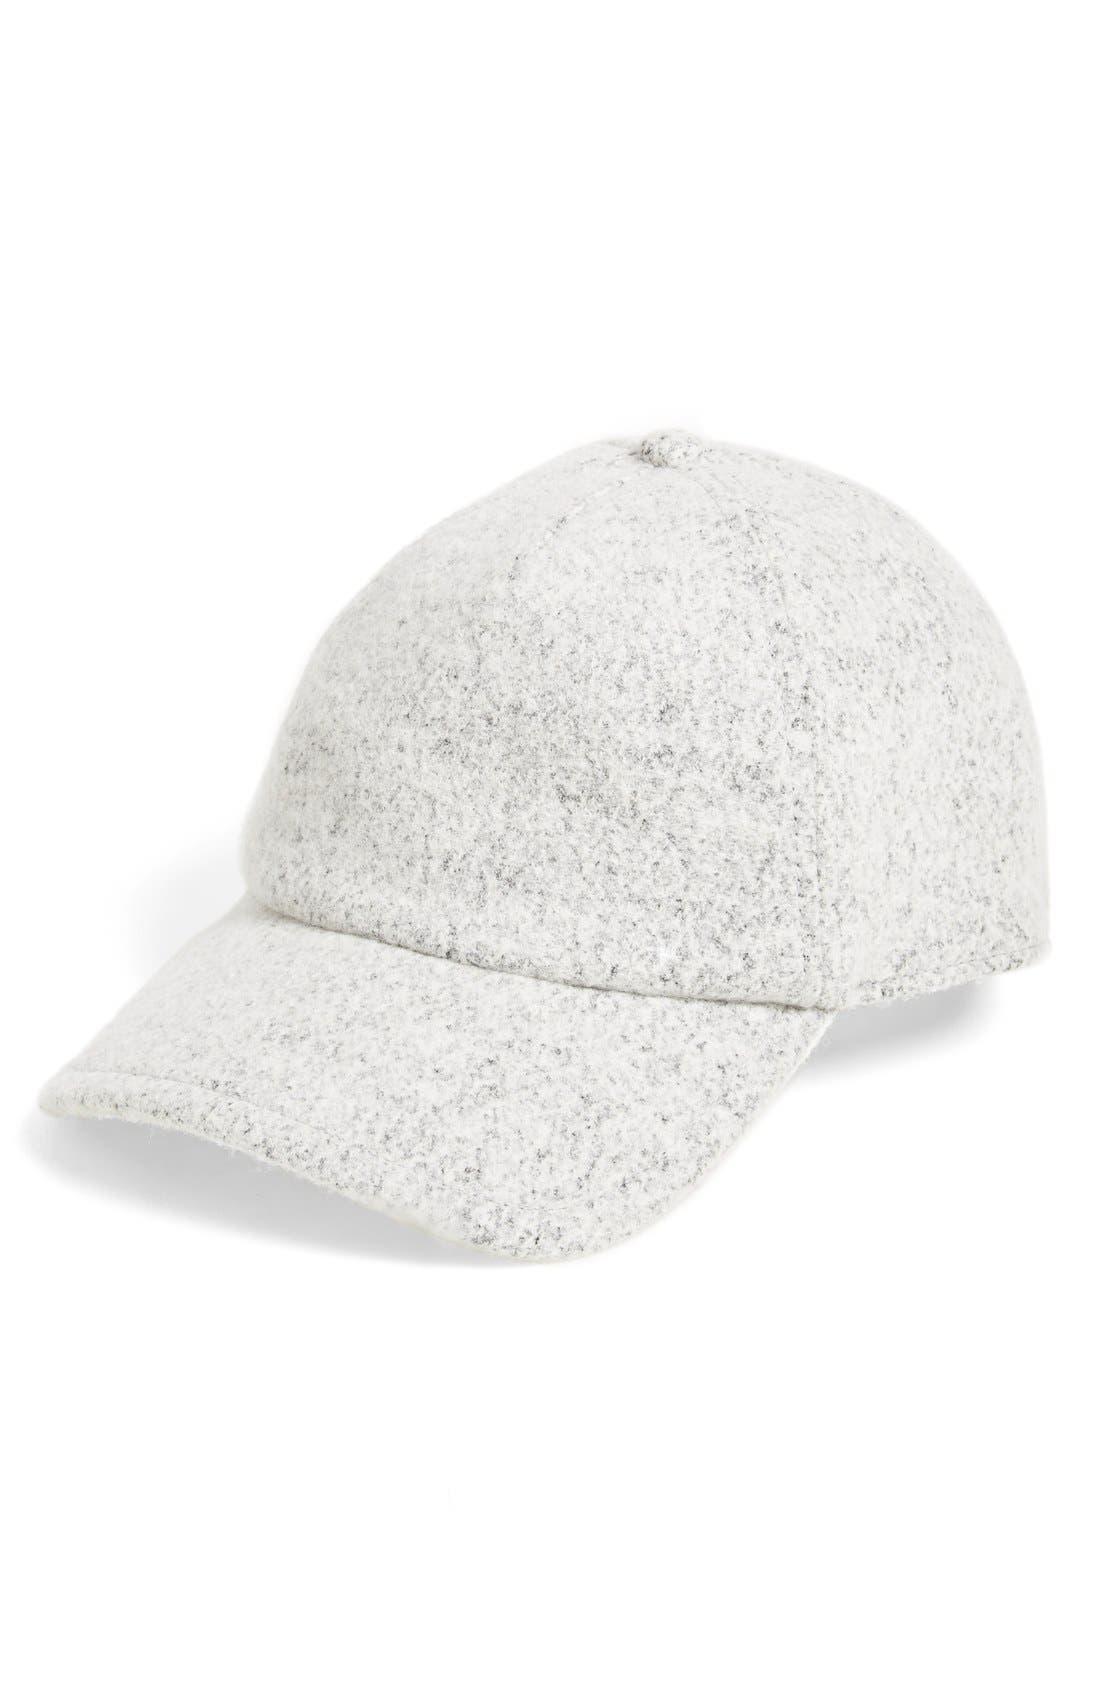 Main Image - rag & bone 'Marilyn' Baseball Cap